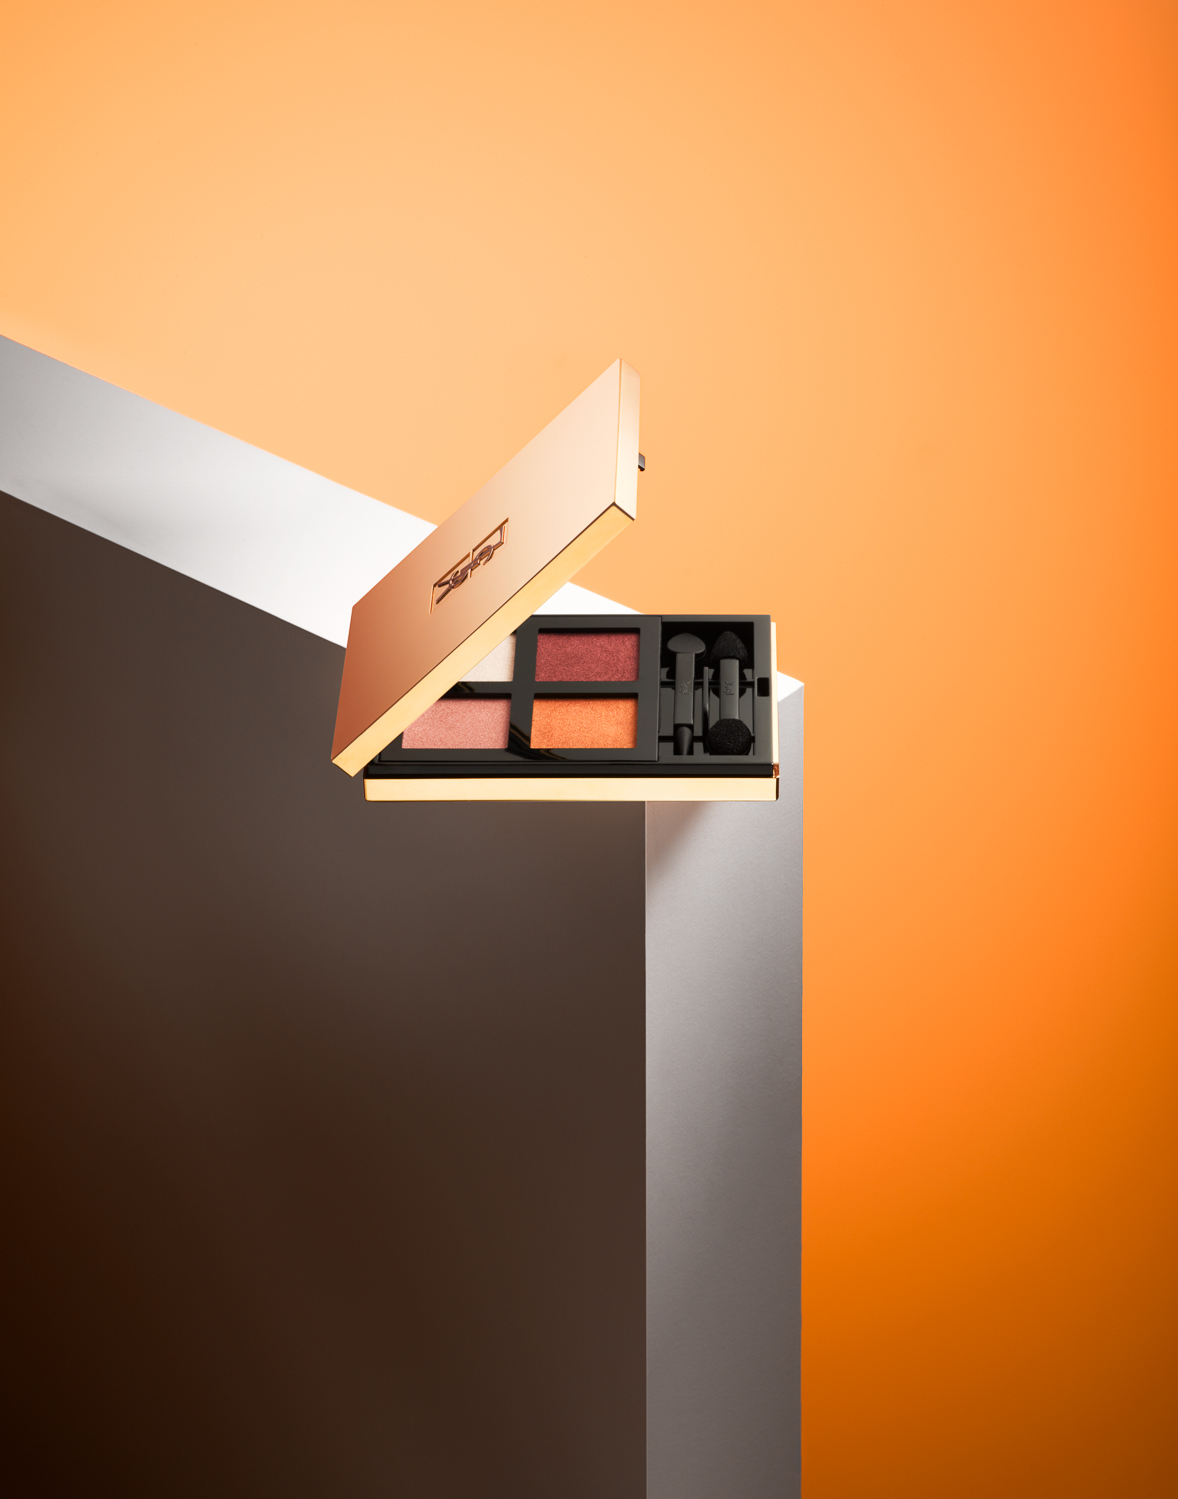 130903 P Cosmetics YSL Compact.jpg